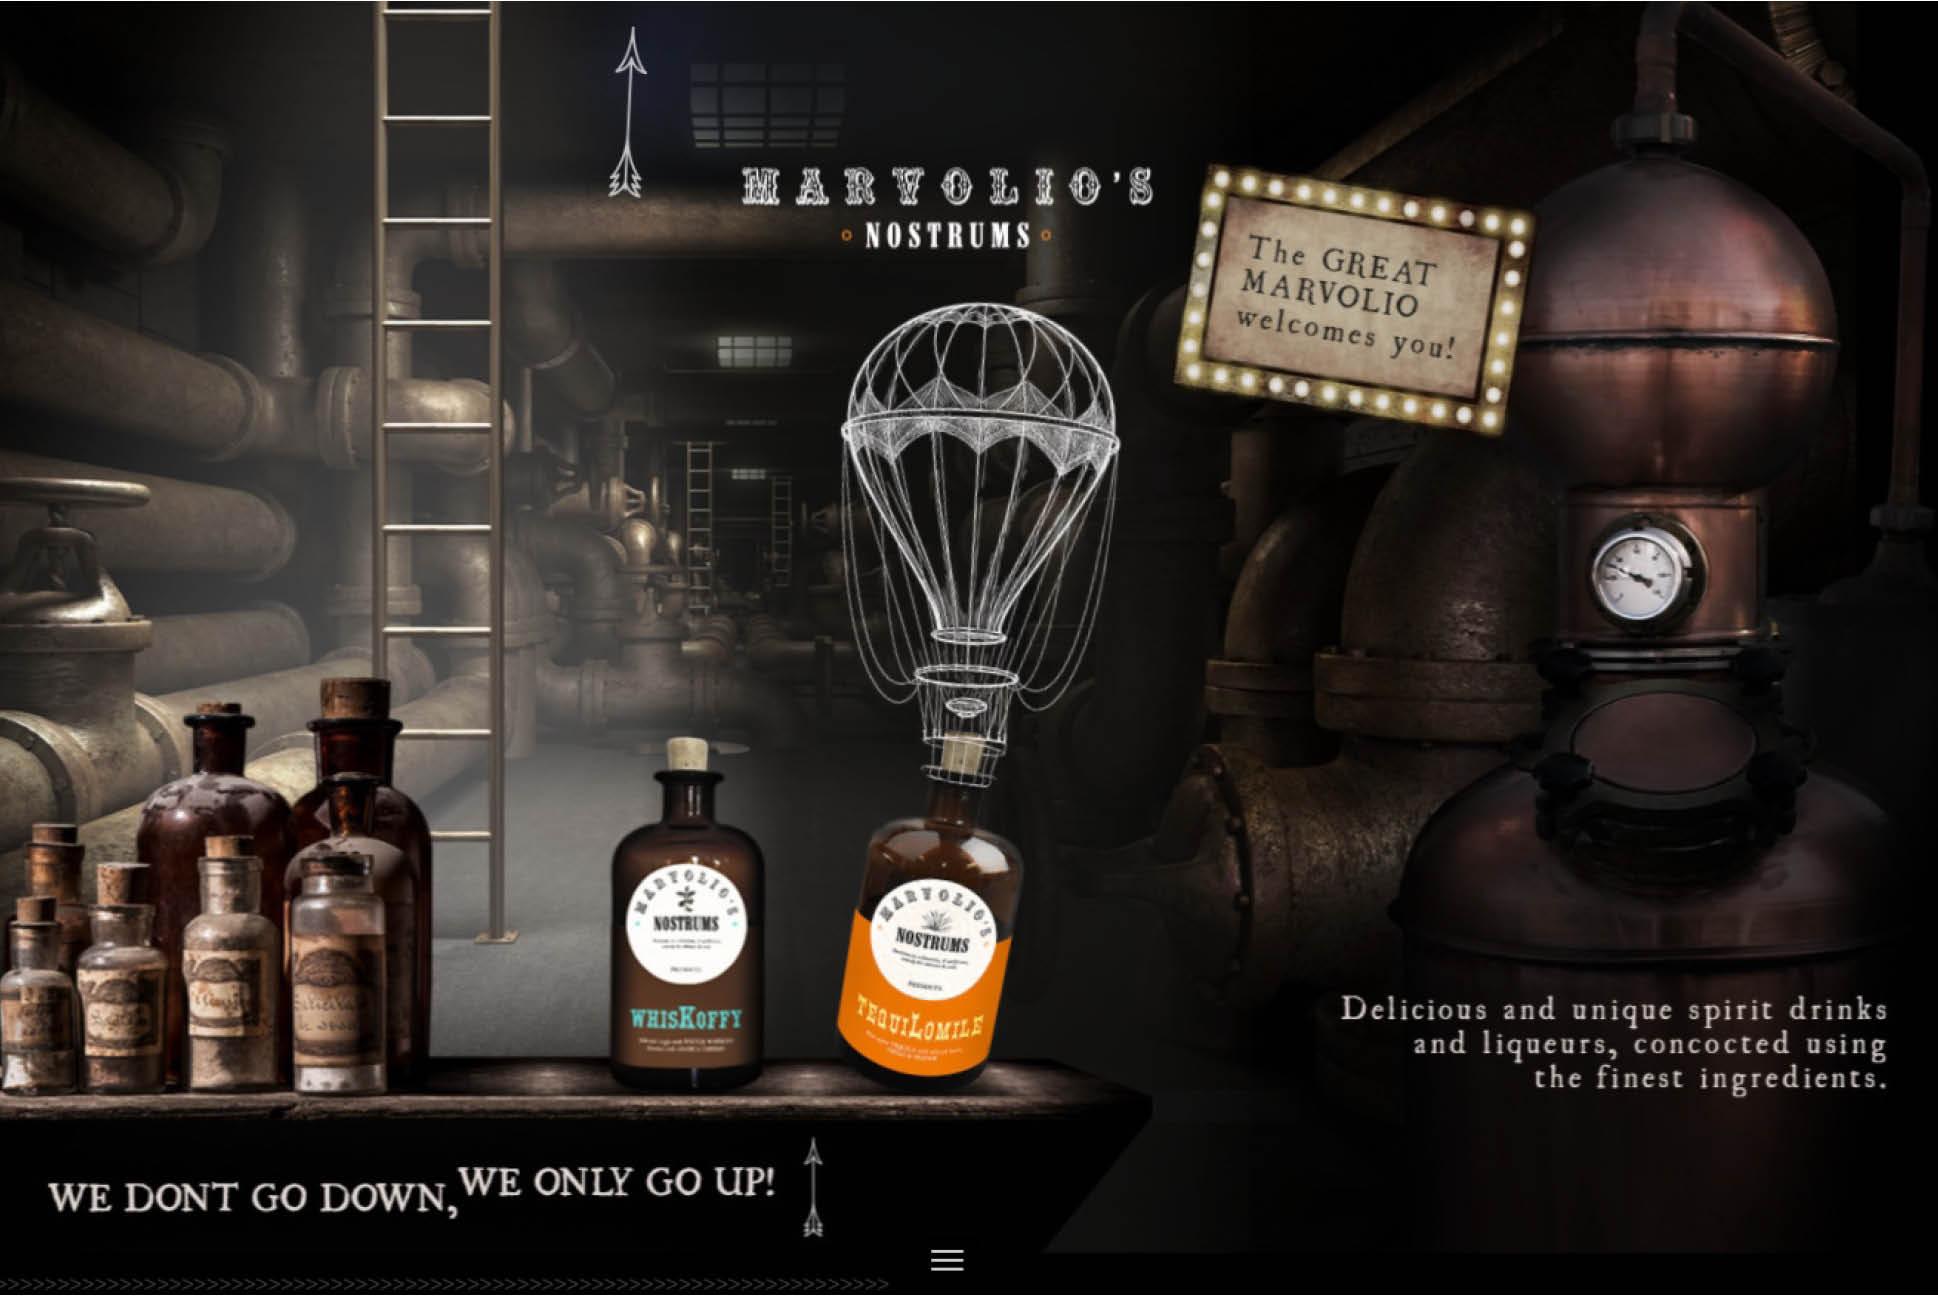 Marvolio's Nostrums   Independent Marketing Packaging, Design and Website Design Services   IM London